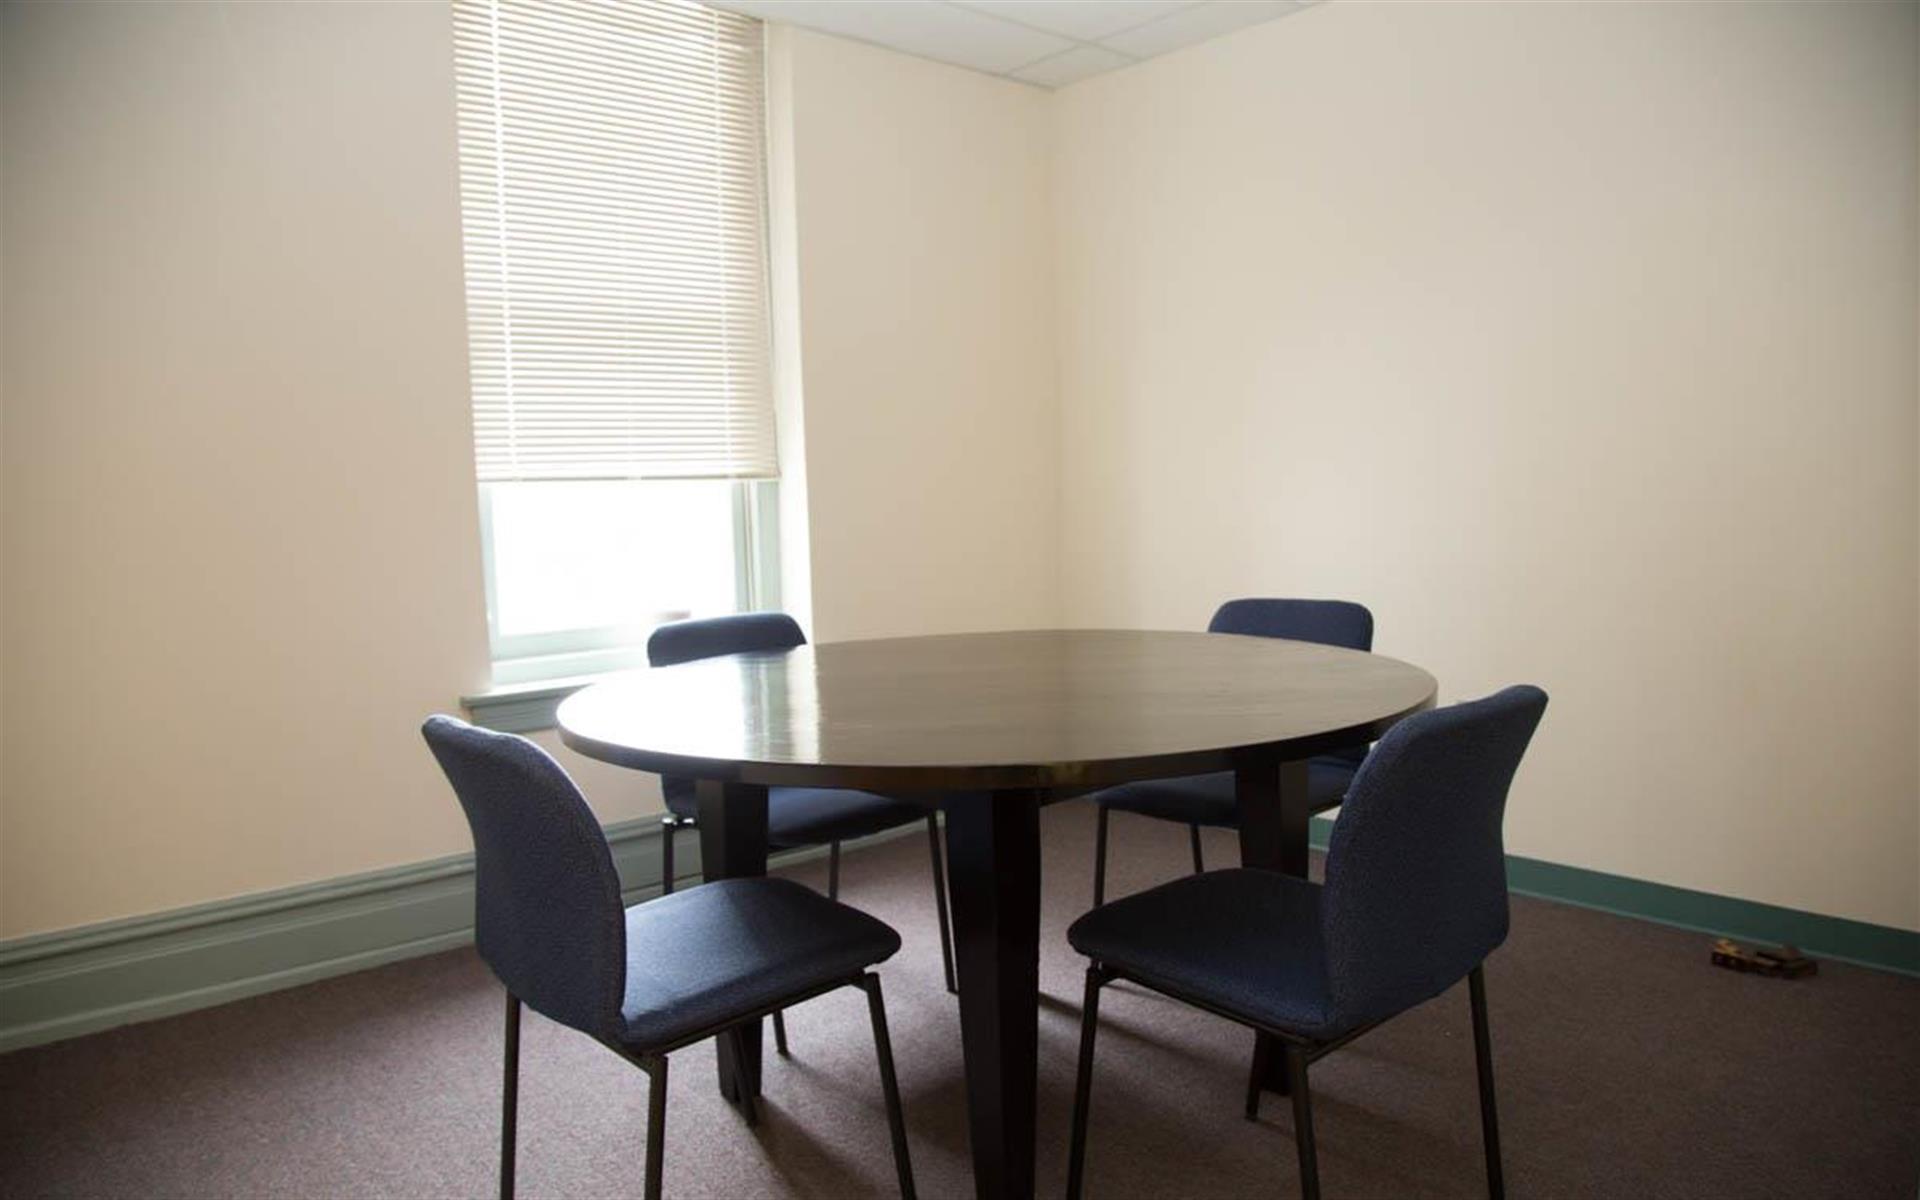 Productivity Pointe - Room 1